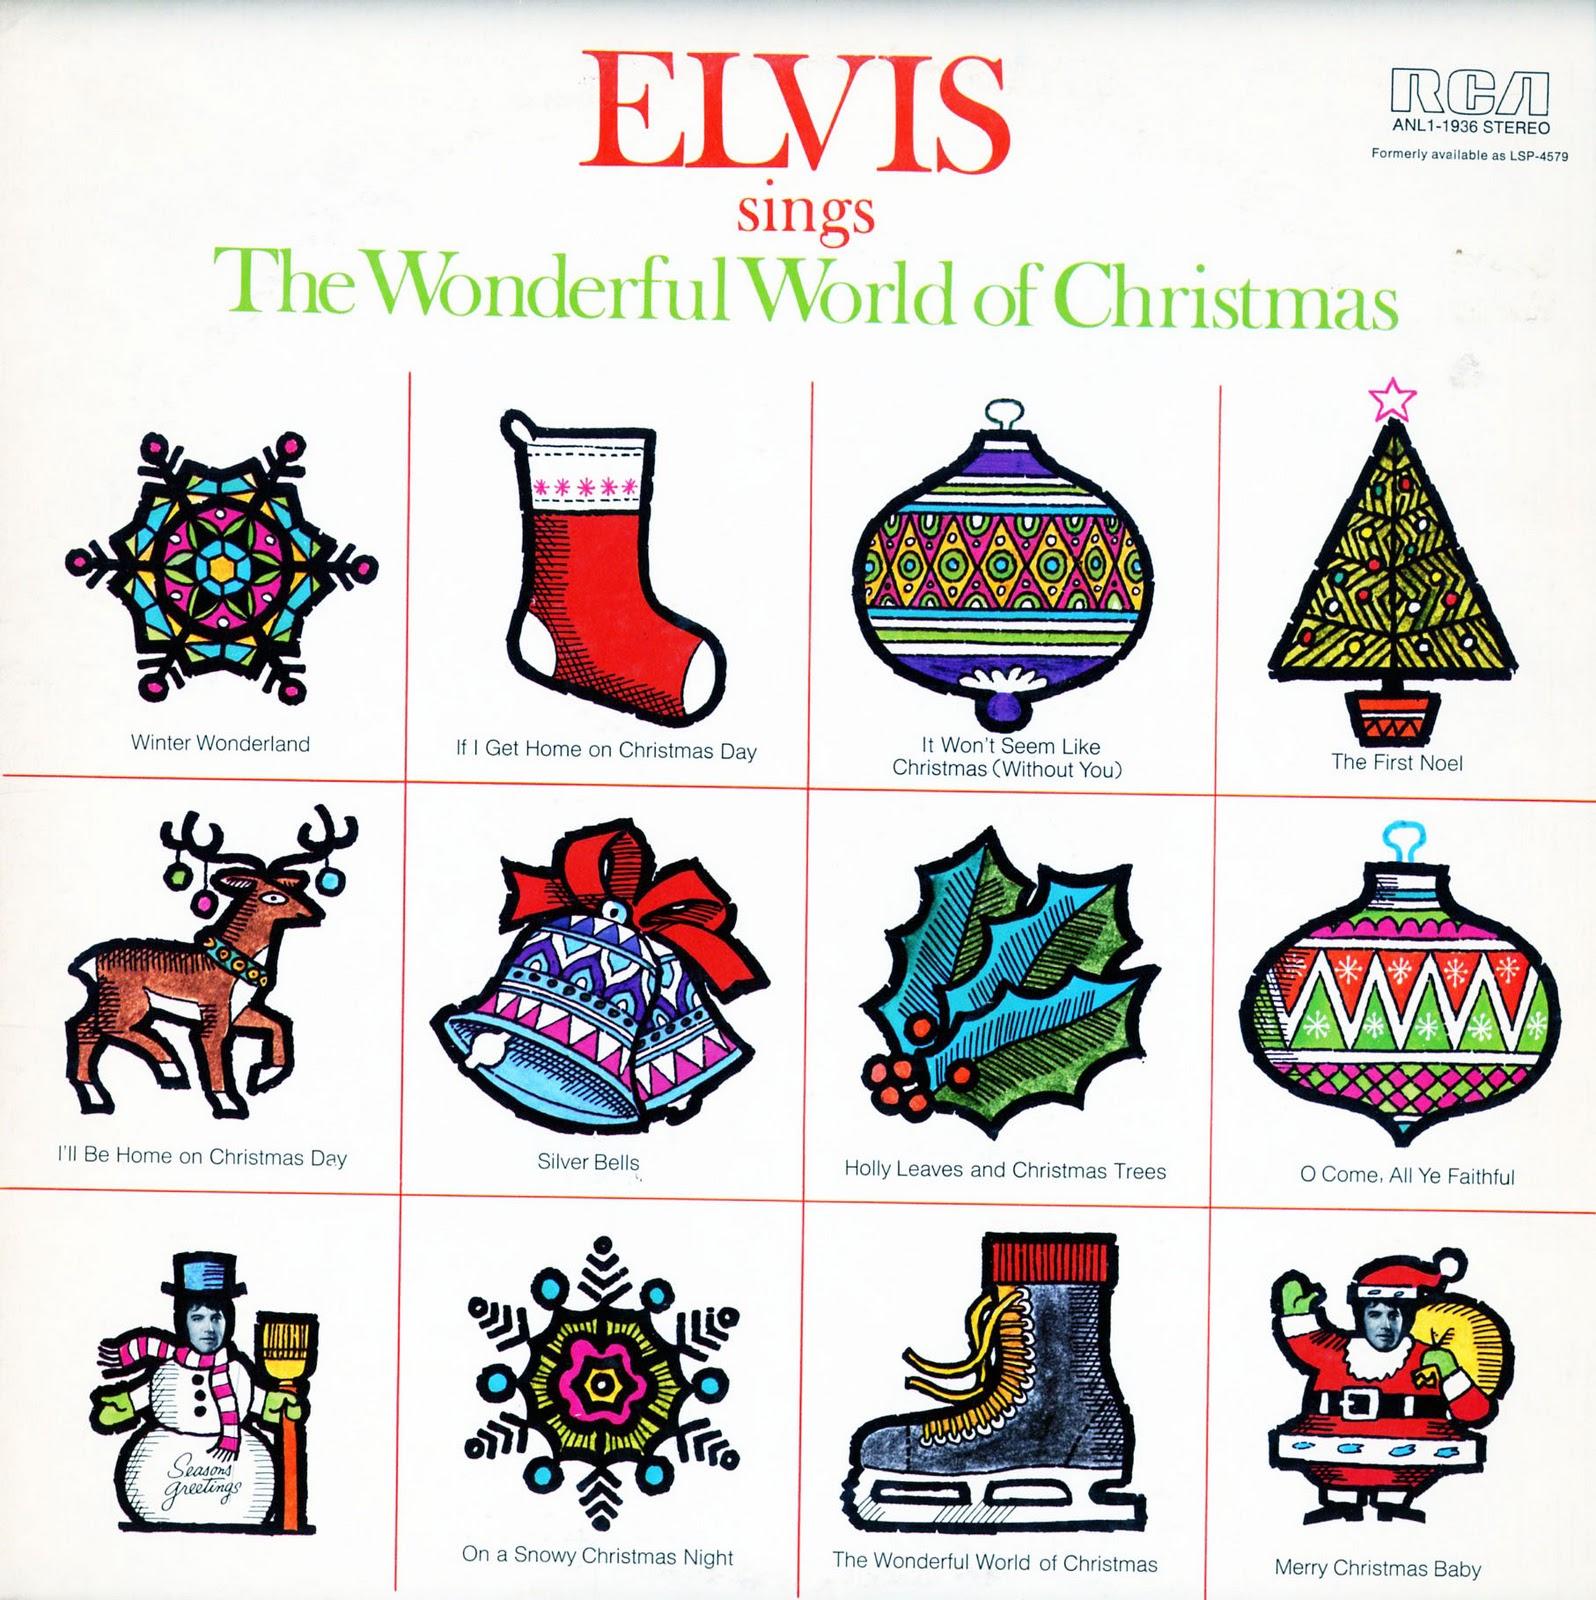 Billboard\'s Top-Selling Christmas Album - 1970s | Unforgettable ...